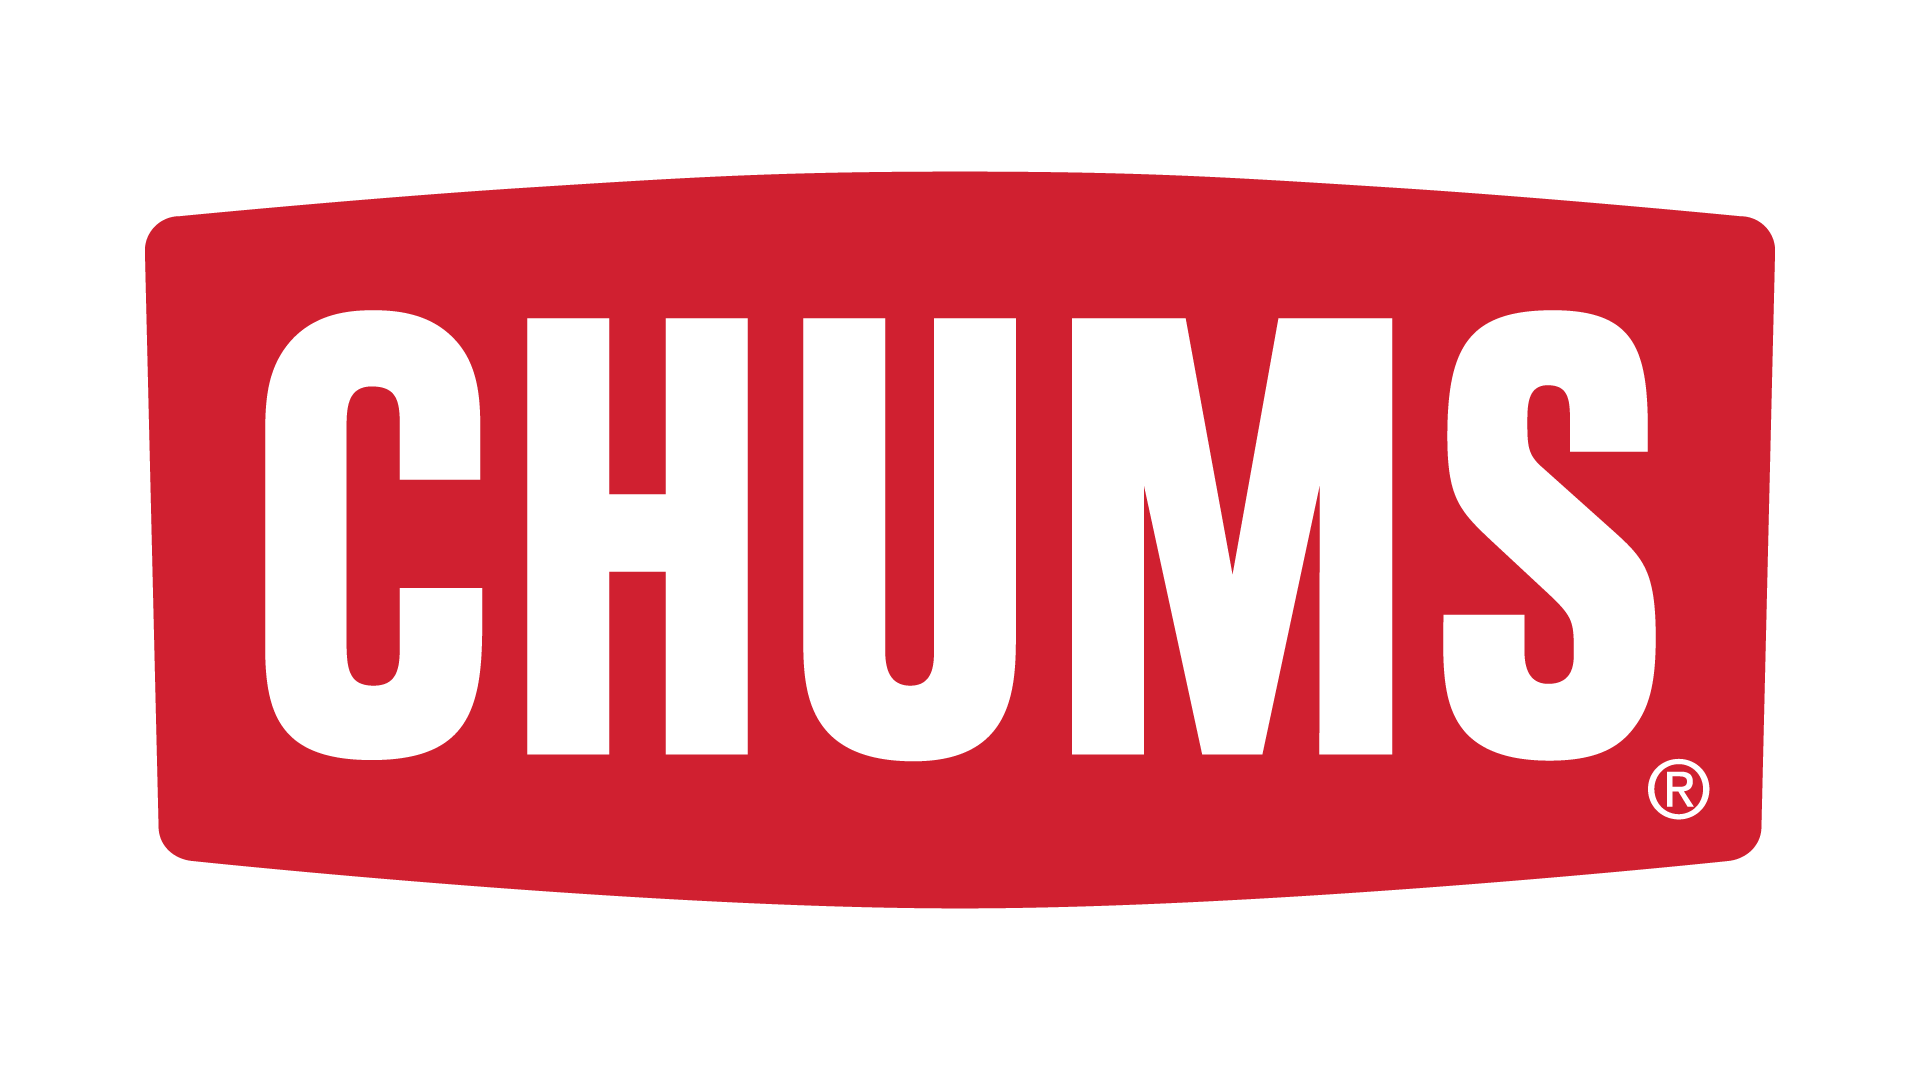 https://mysunrays.com/wp-content/uploads/2021/09/Chums-Logo-Badge-Red-RGB.png